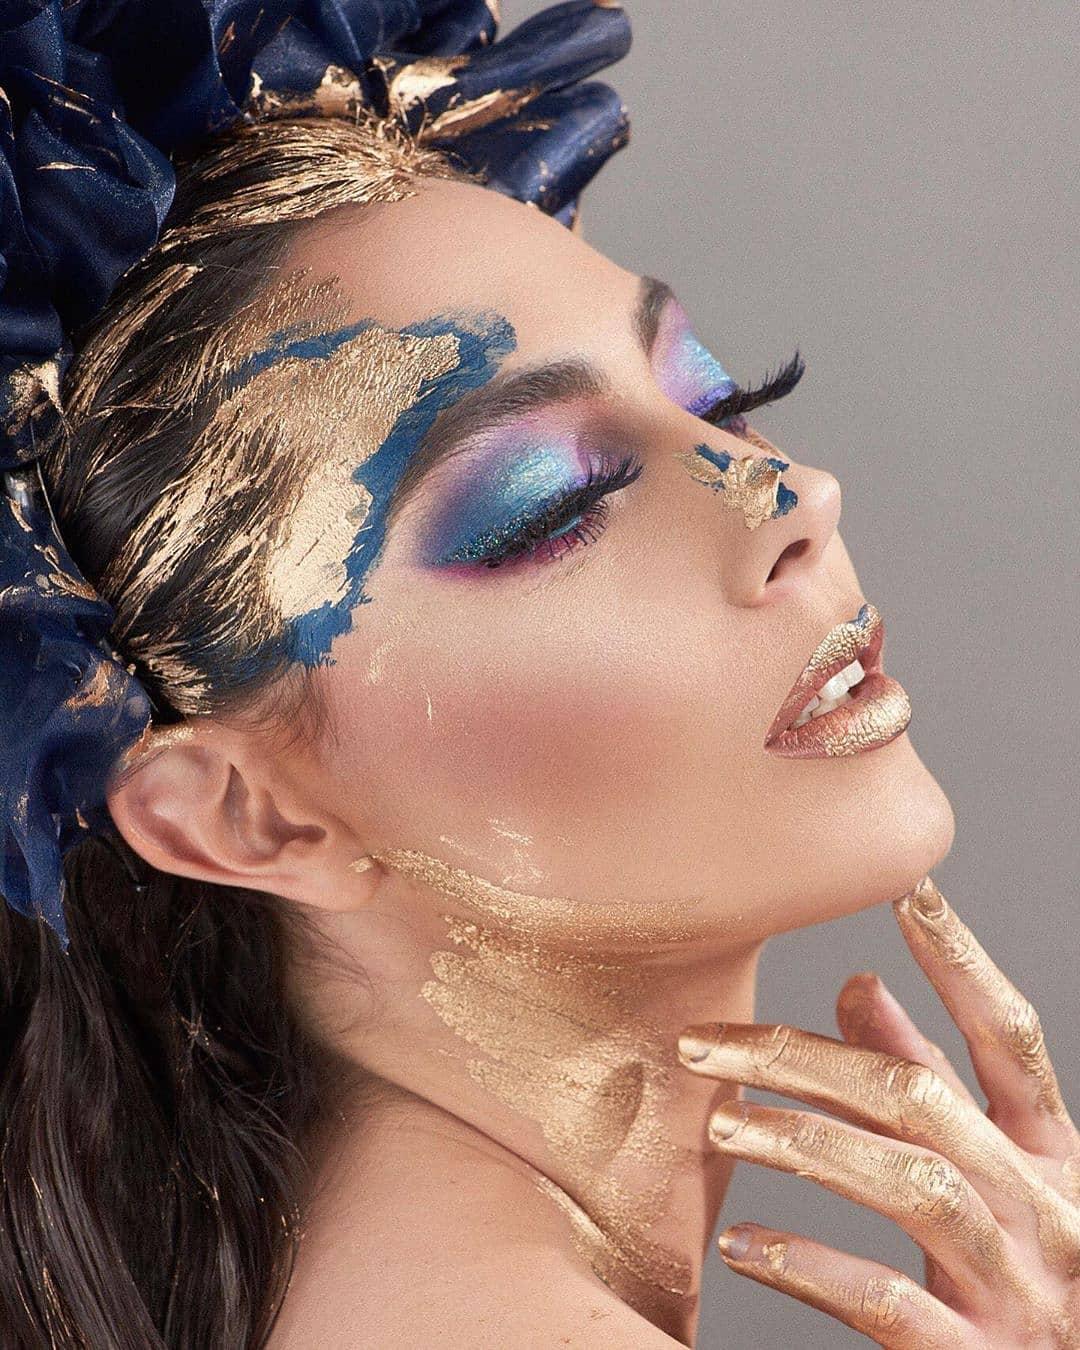 maria malo, 1st runner-up de miss grand international 2019. - Página 5 61035810